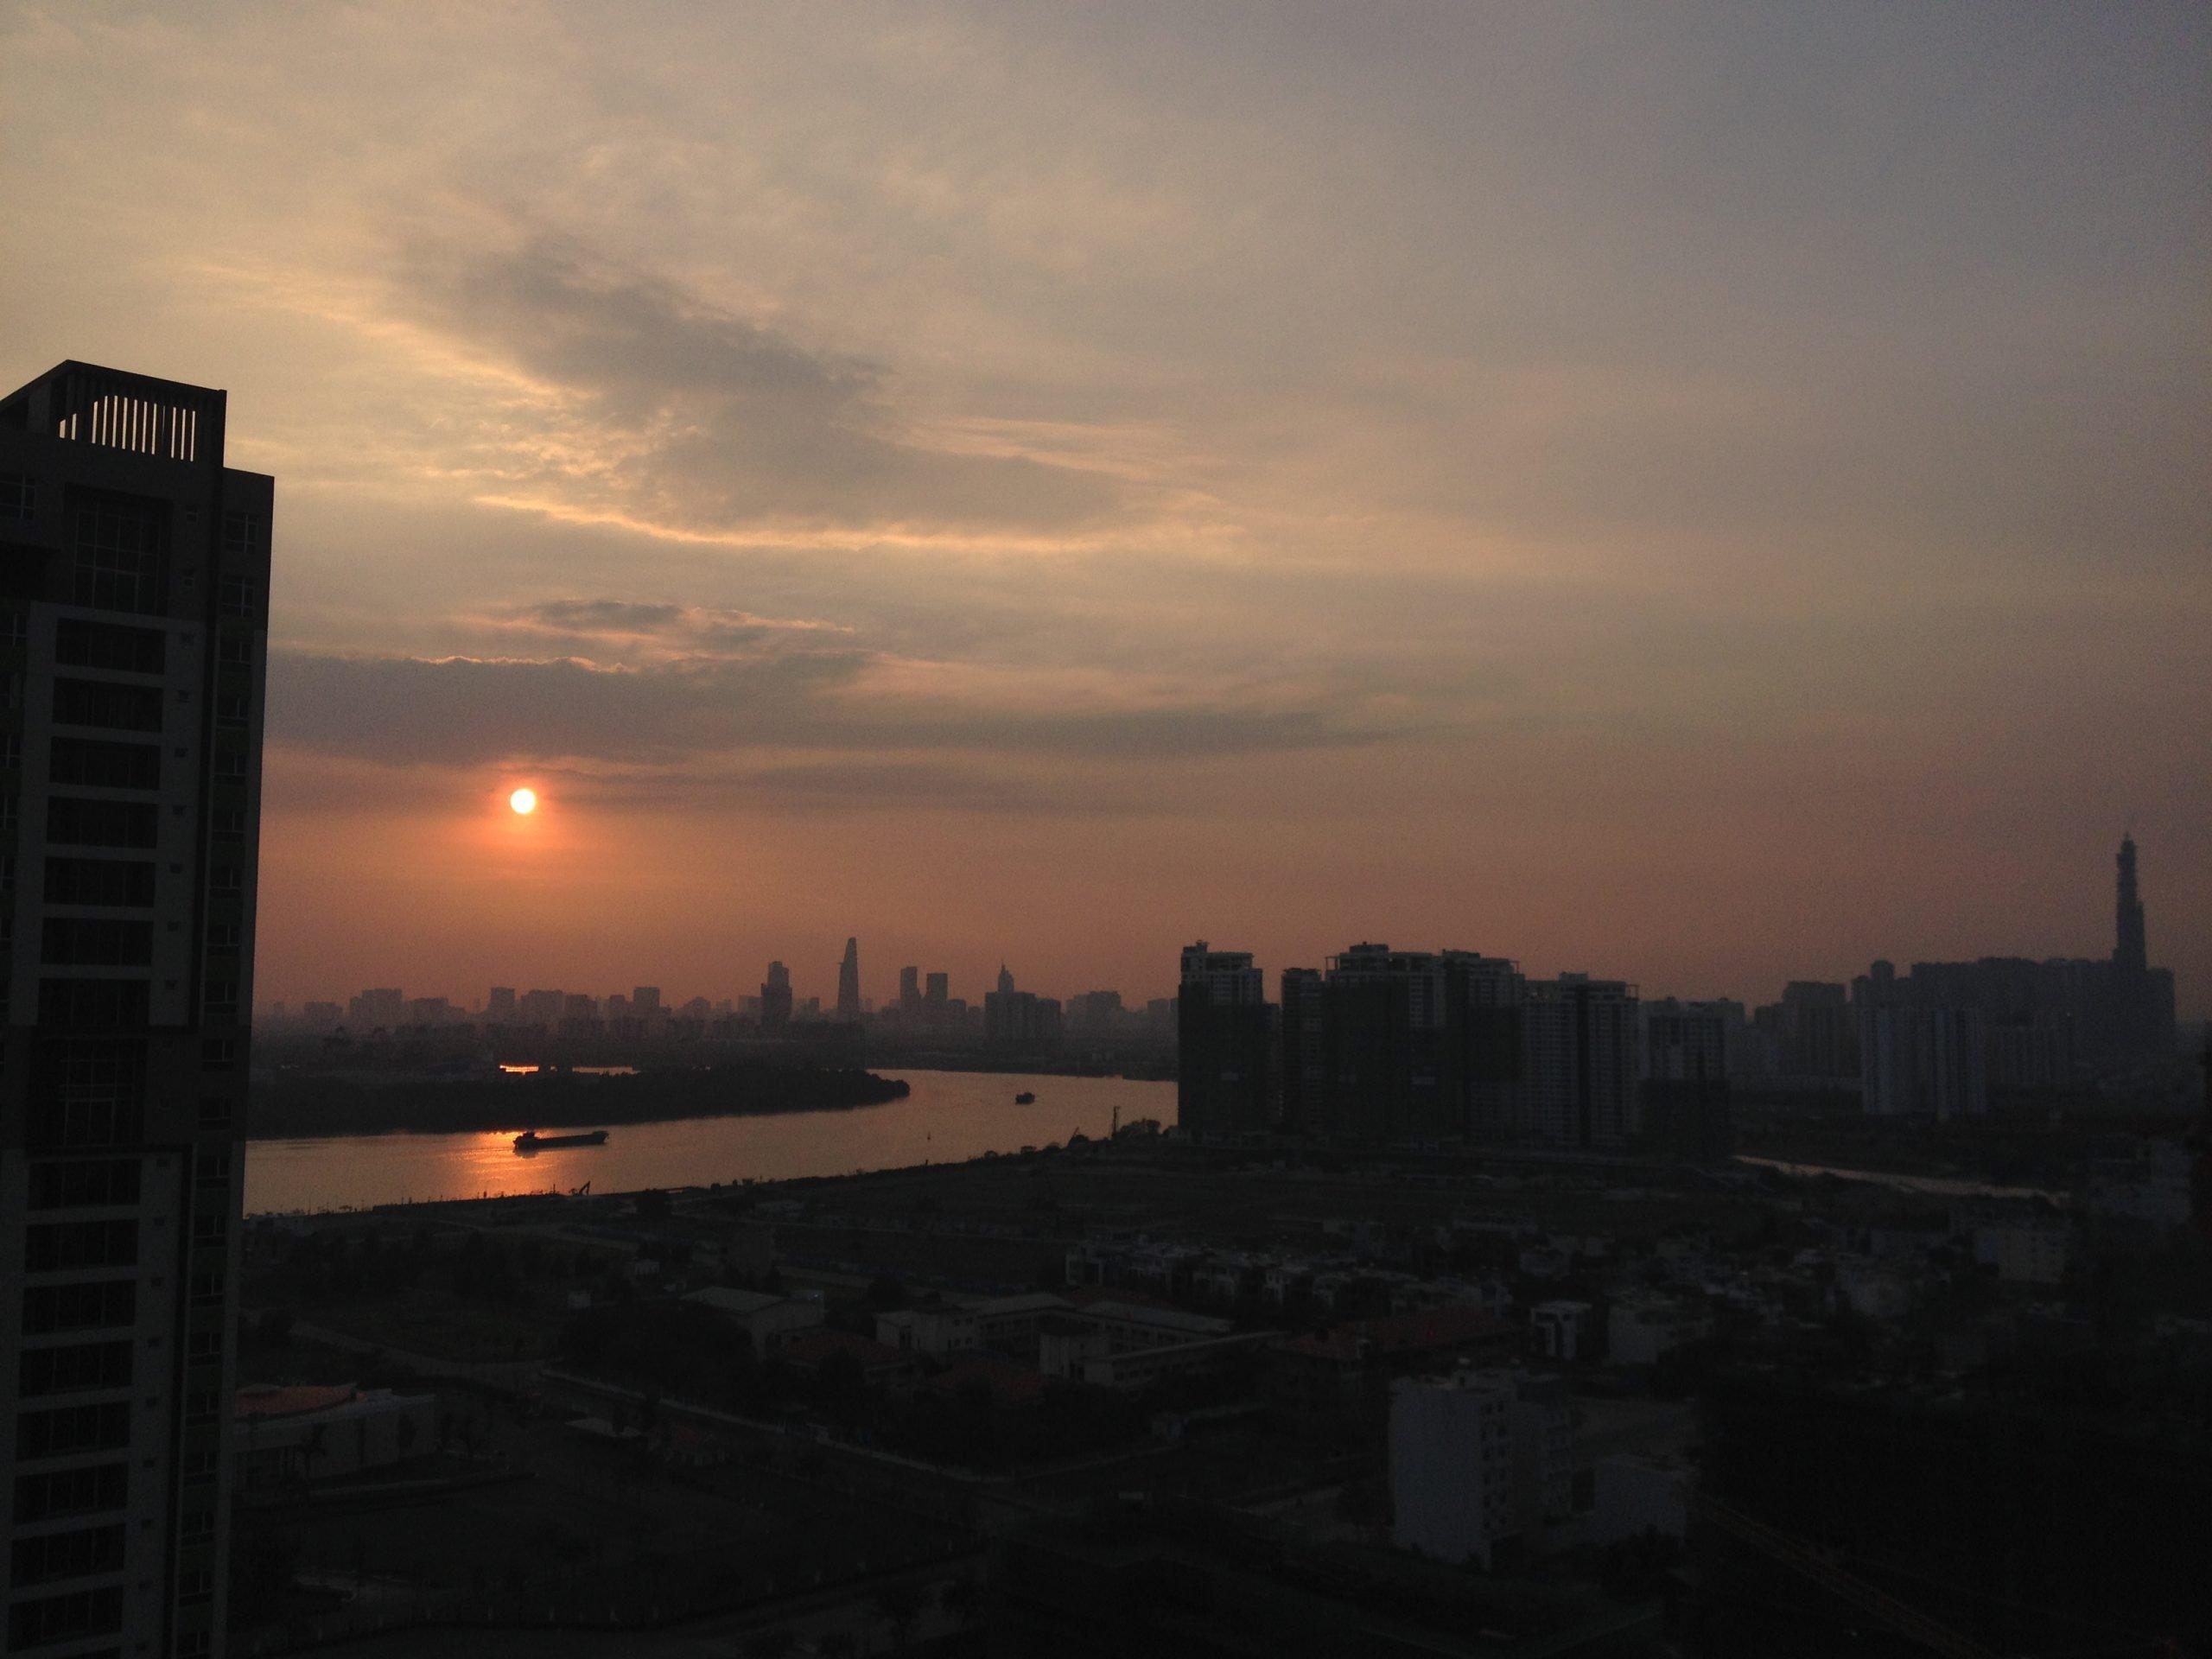 saigon-sunset-by-ryan-patey